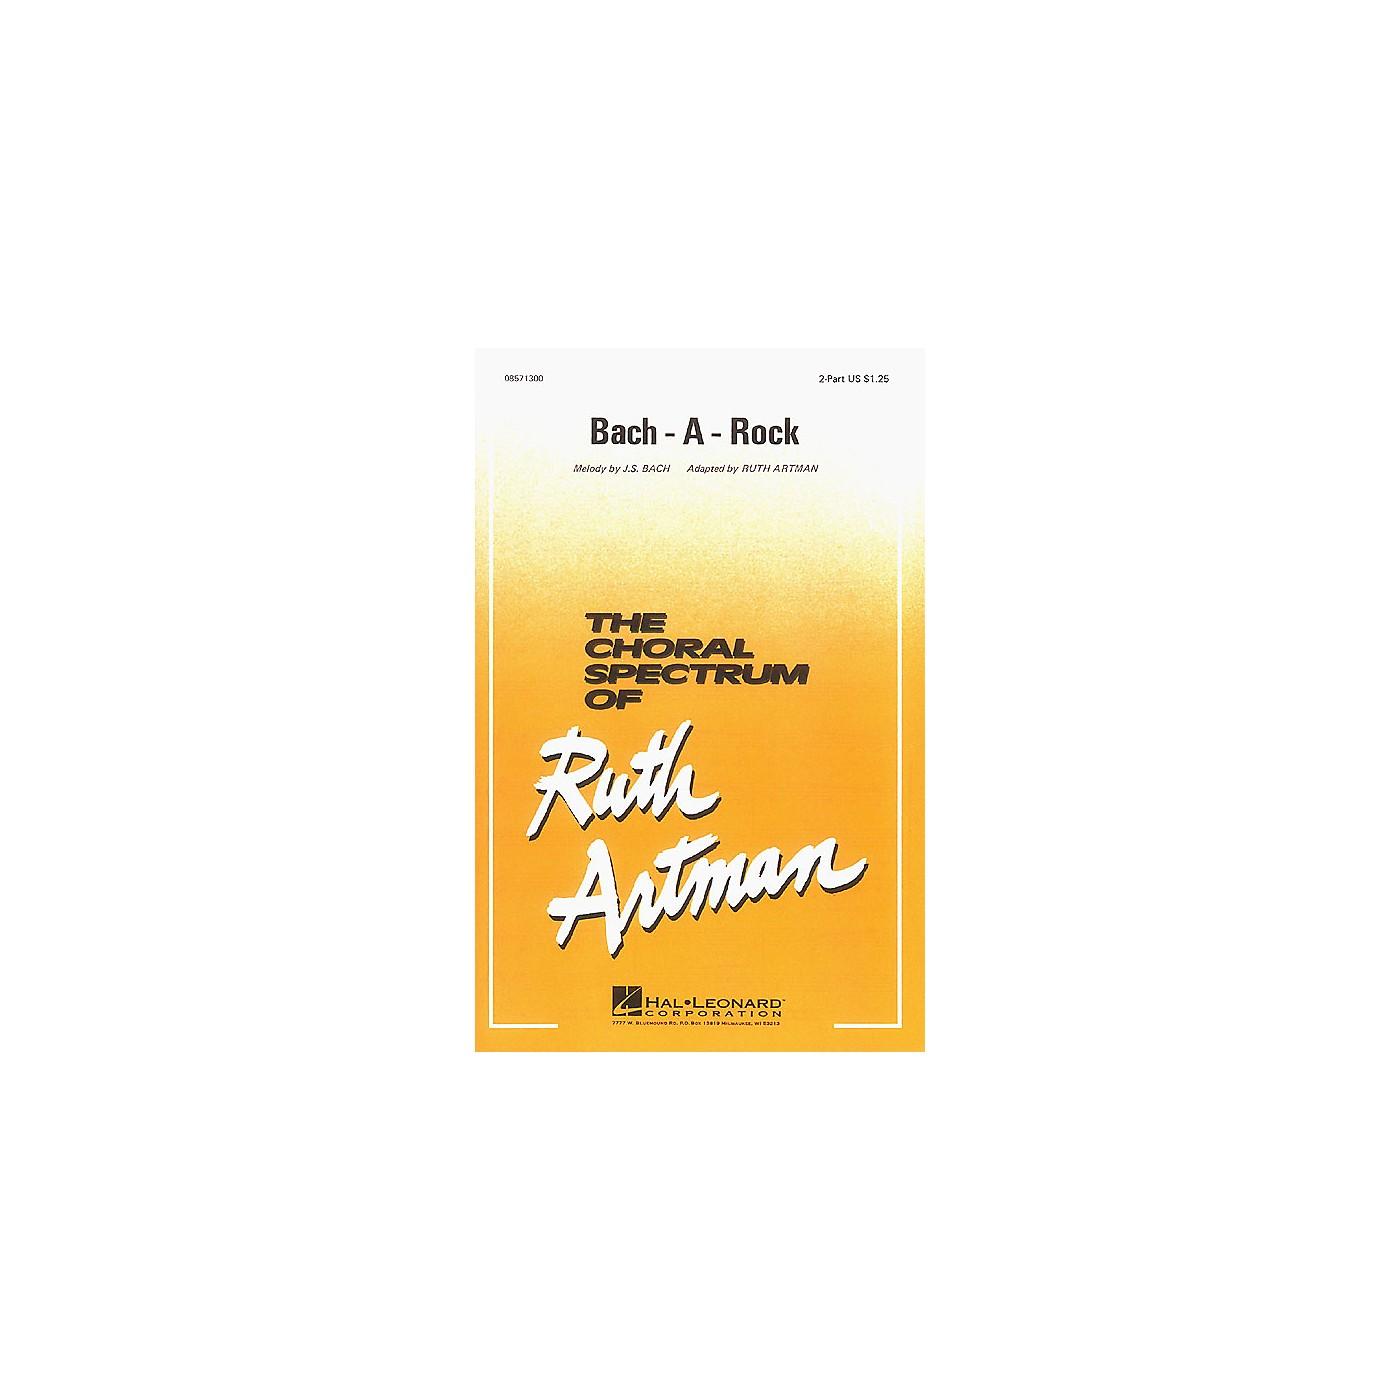 Hal Leonard Bach-A-Rock 2-Part arranged by Ruth Artman thumbnail